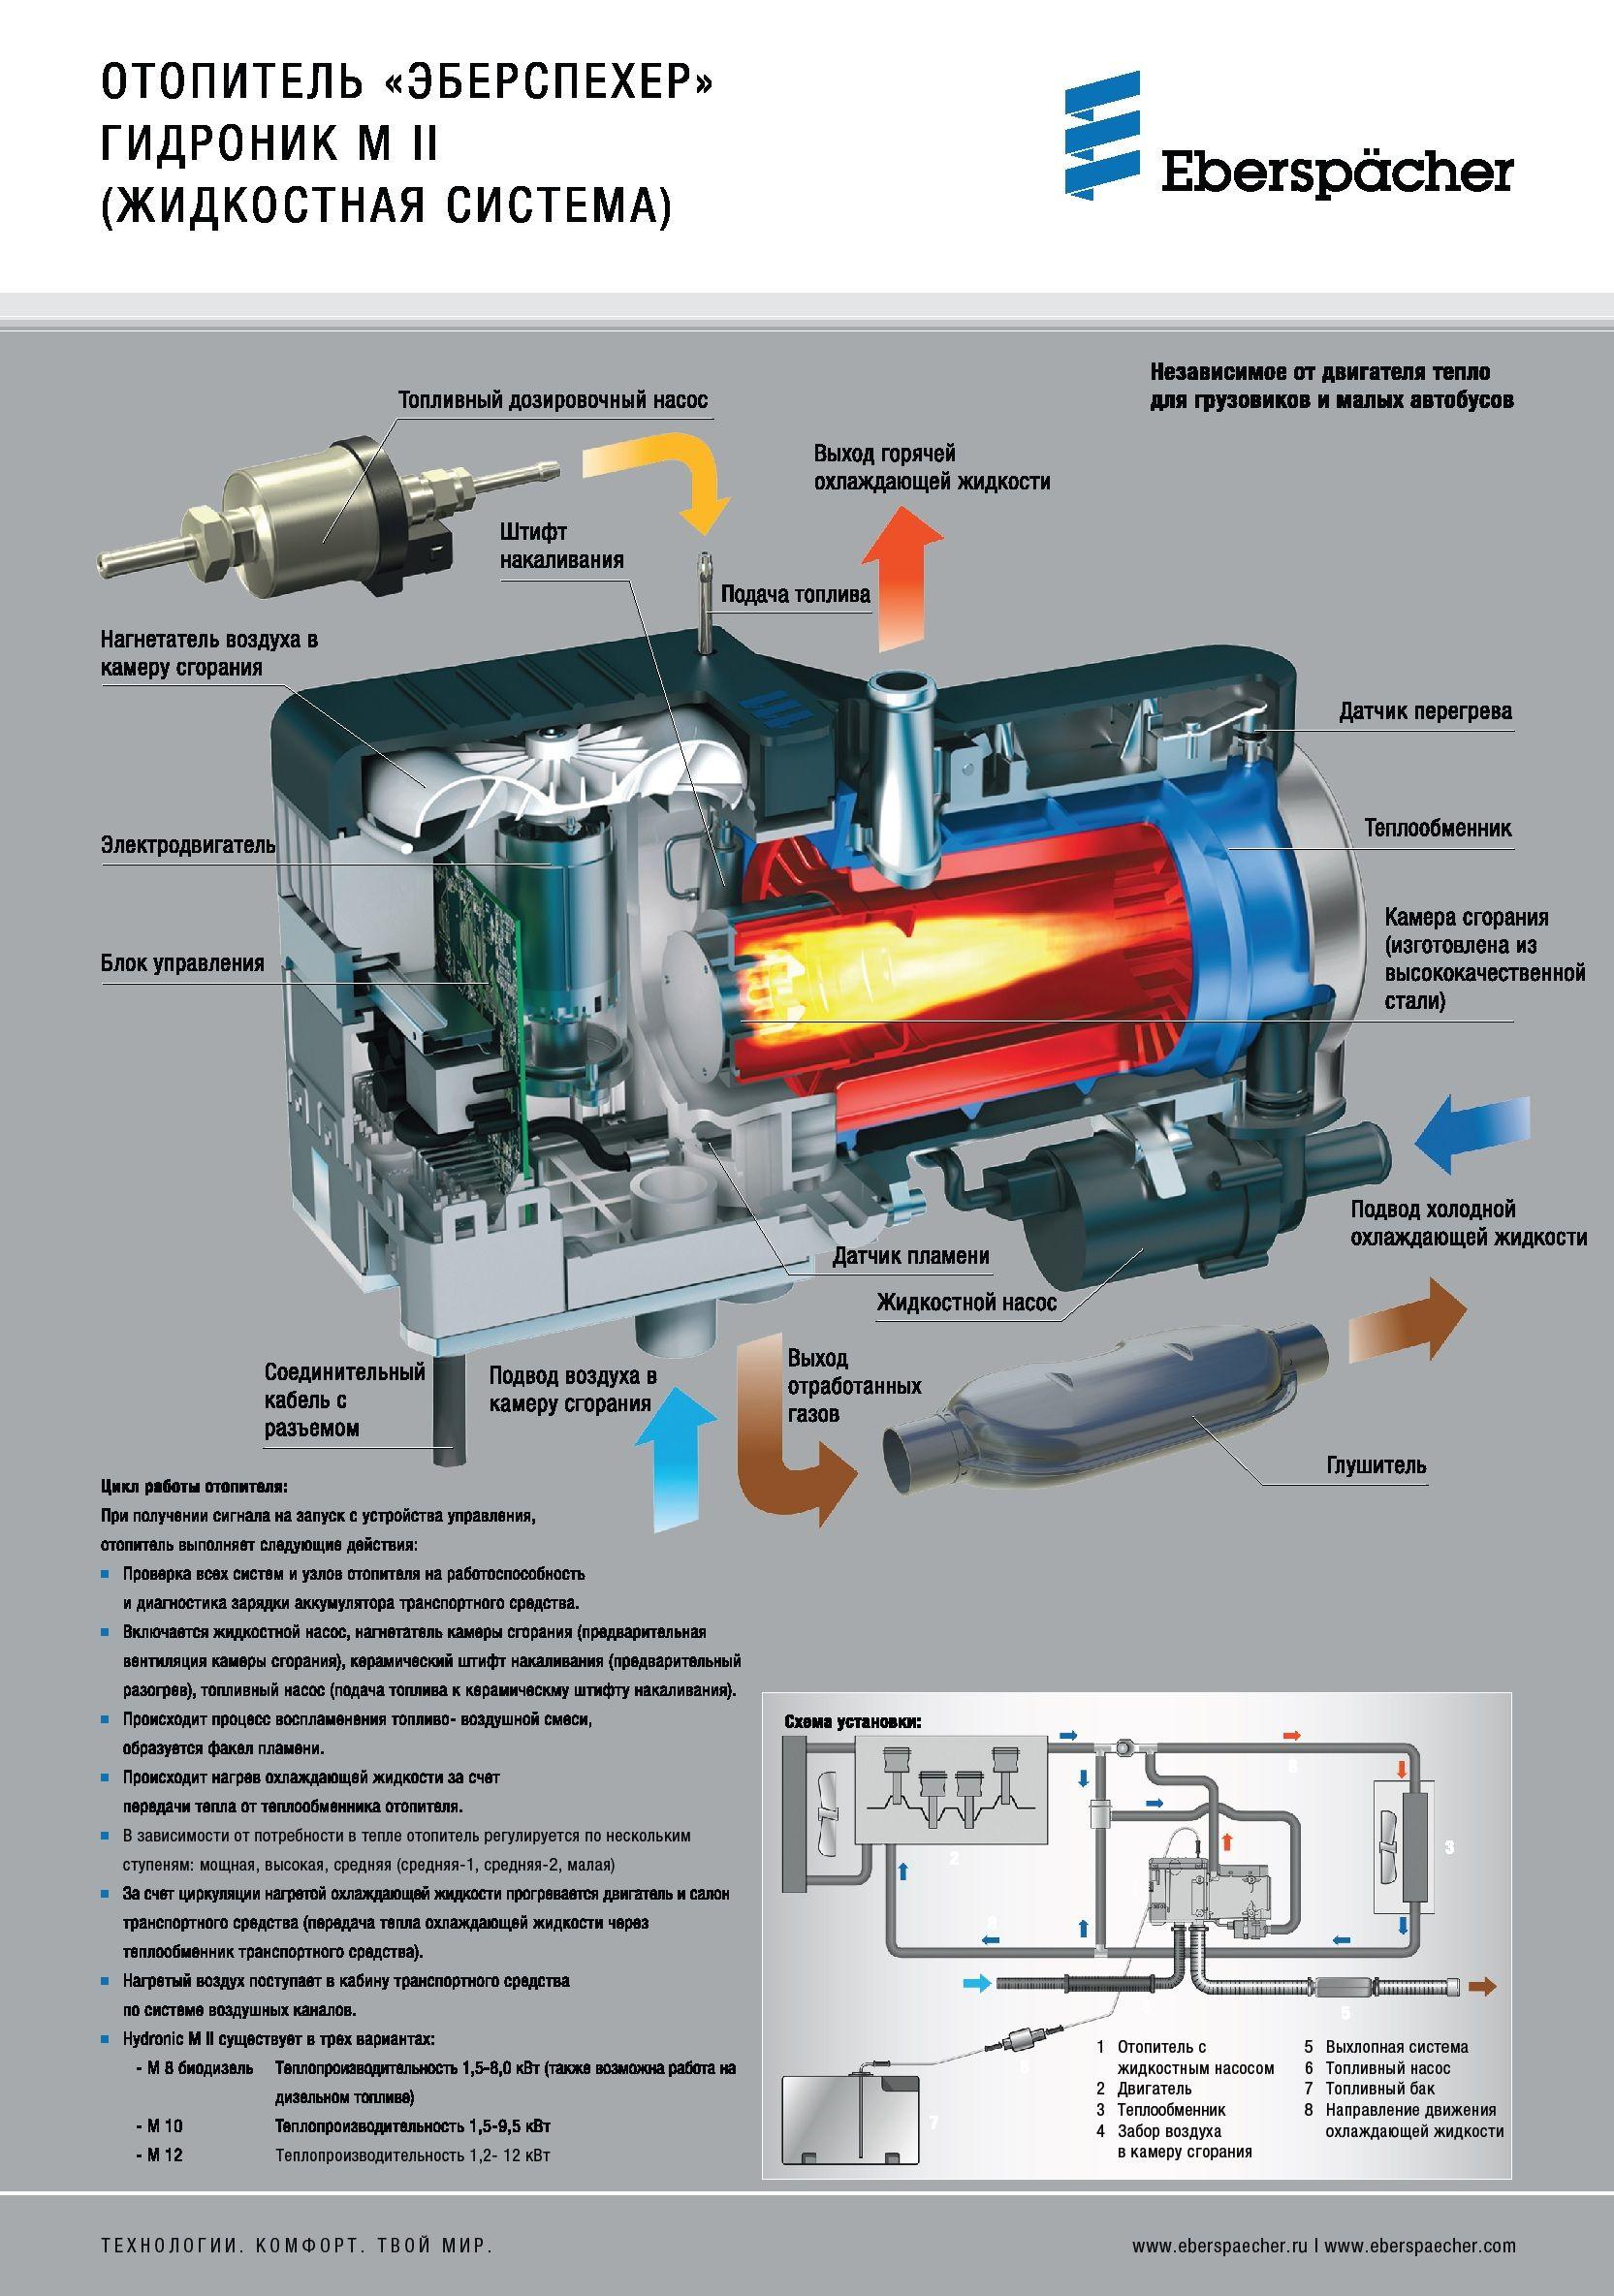 Гидроник схема установки